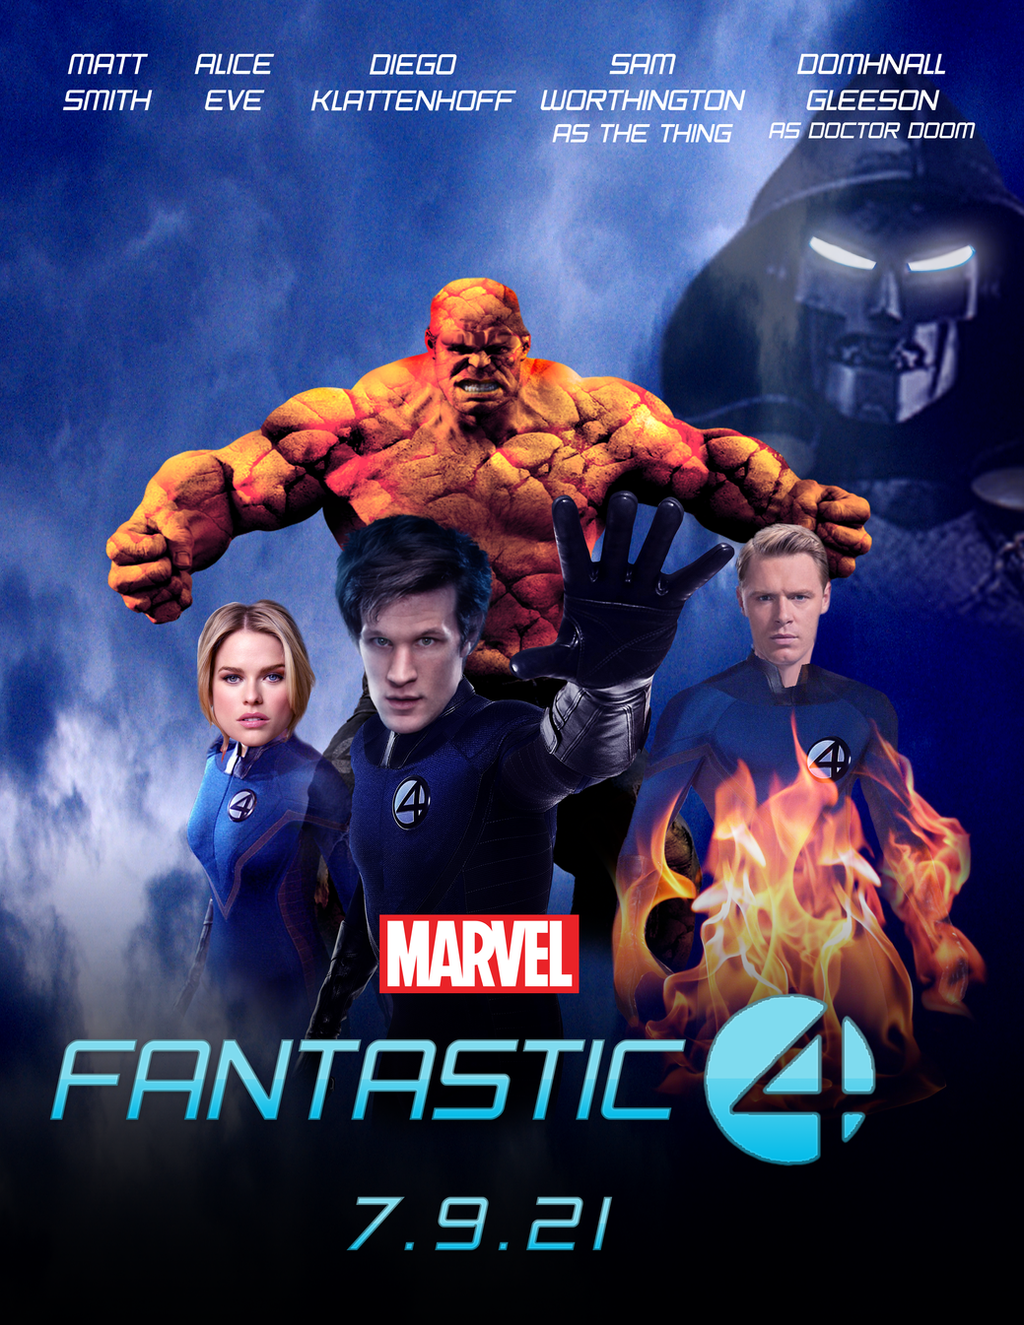 fantastic four mcu reboot poster by nunkinz1000 on deviantart